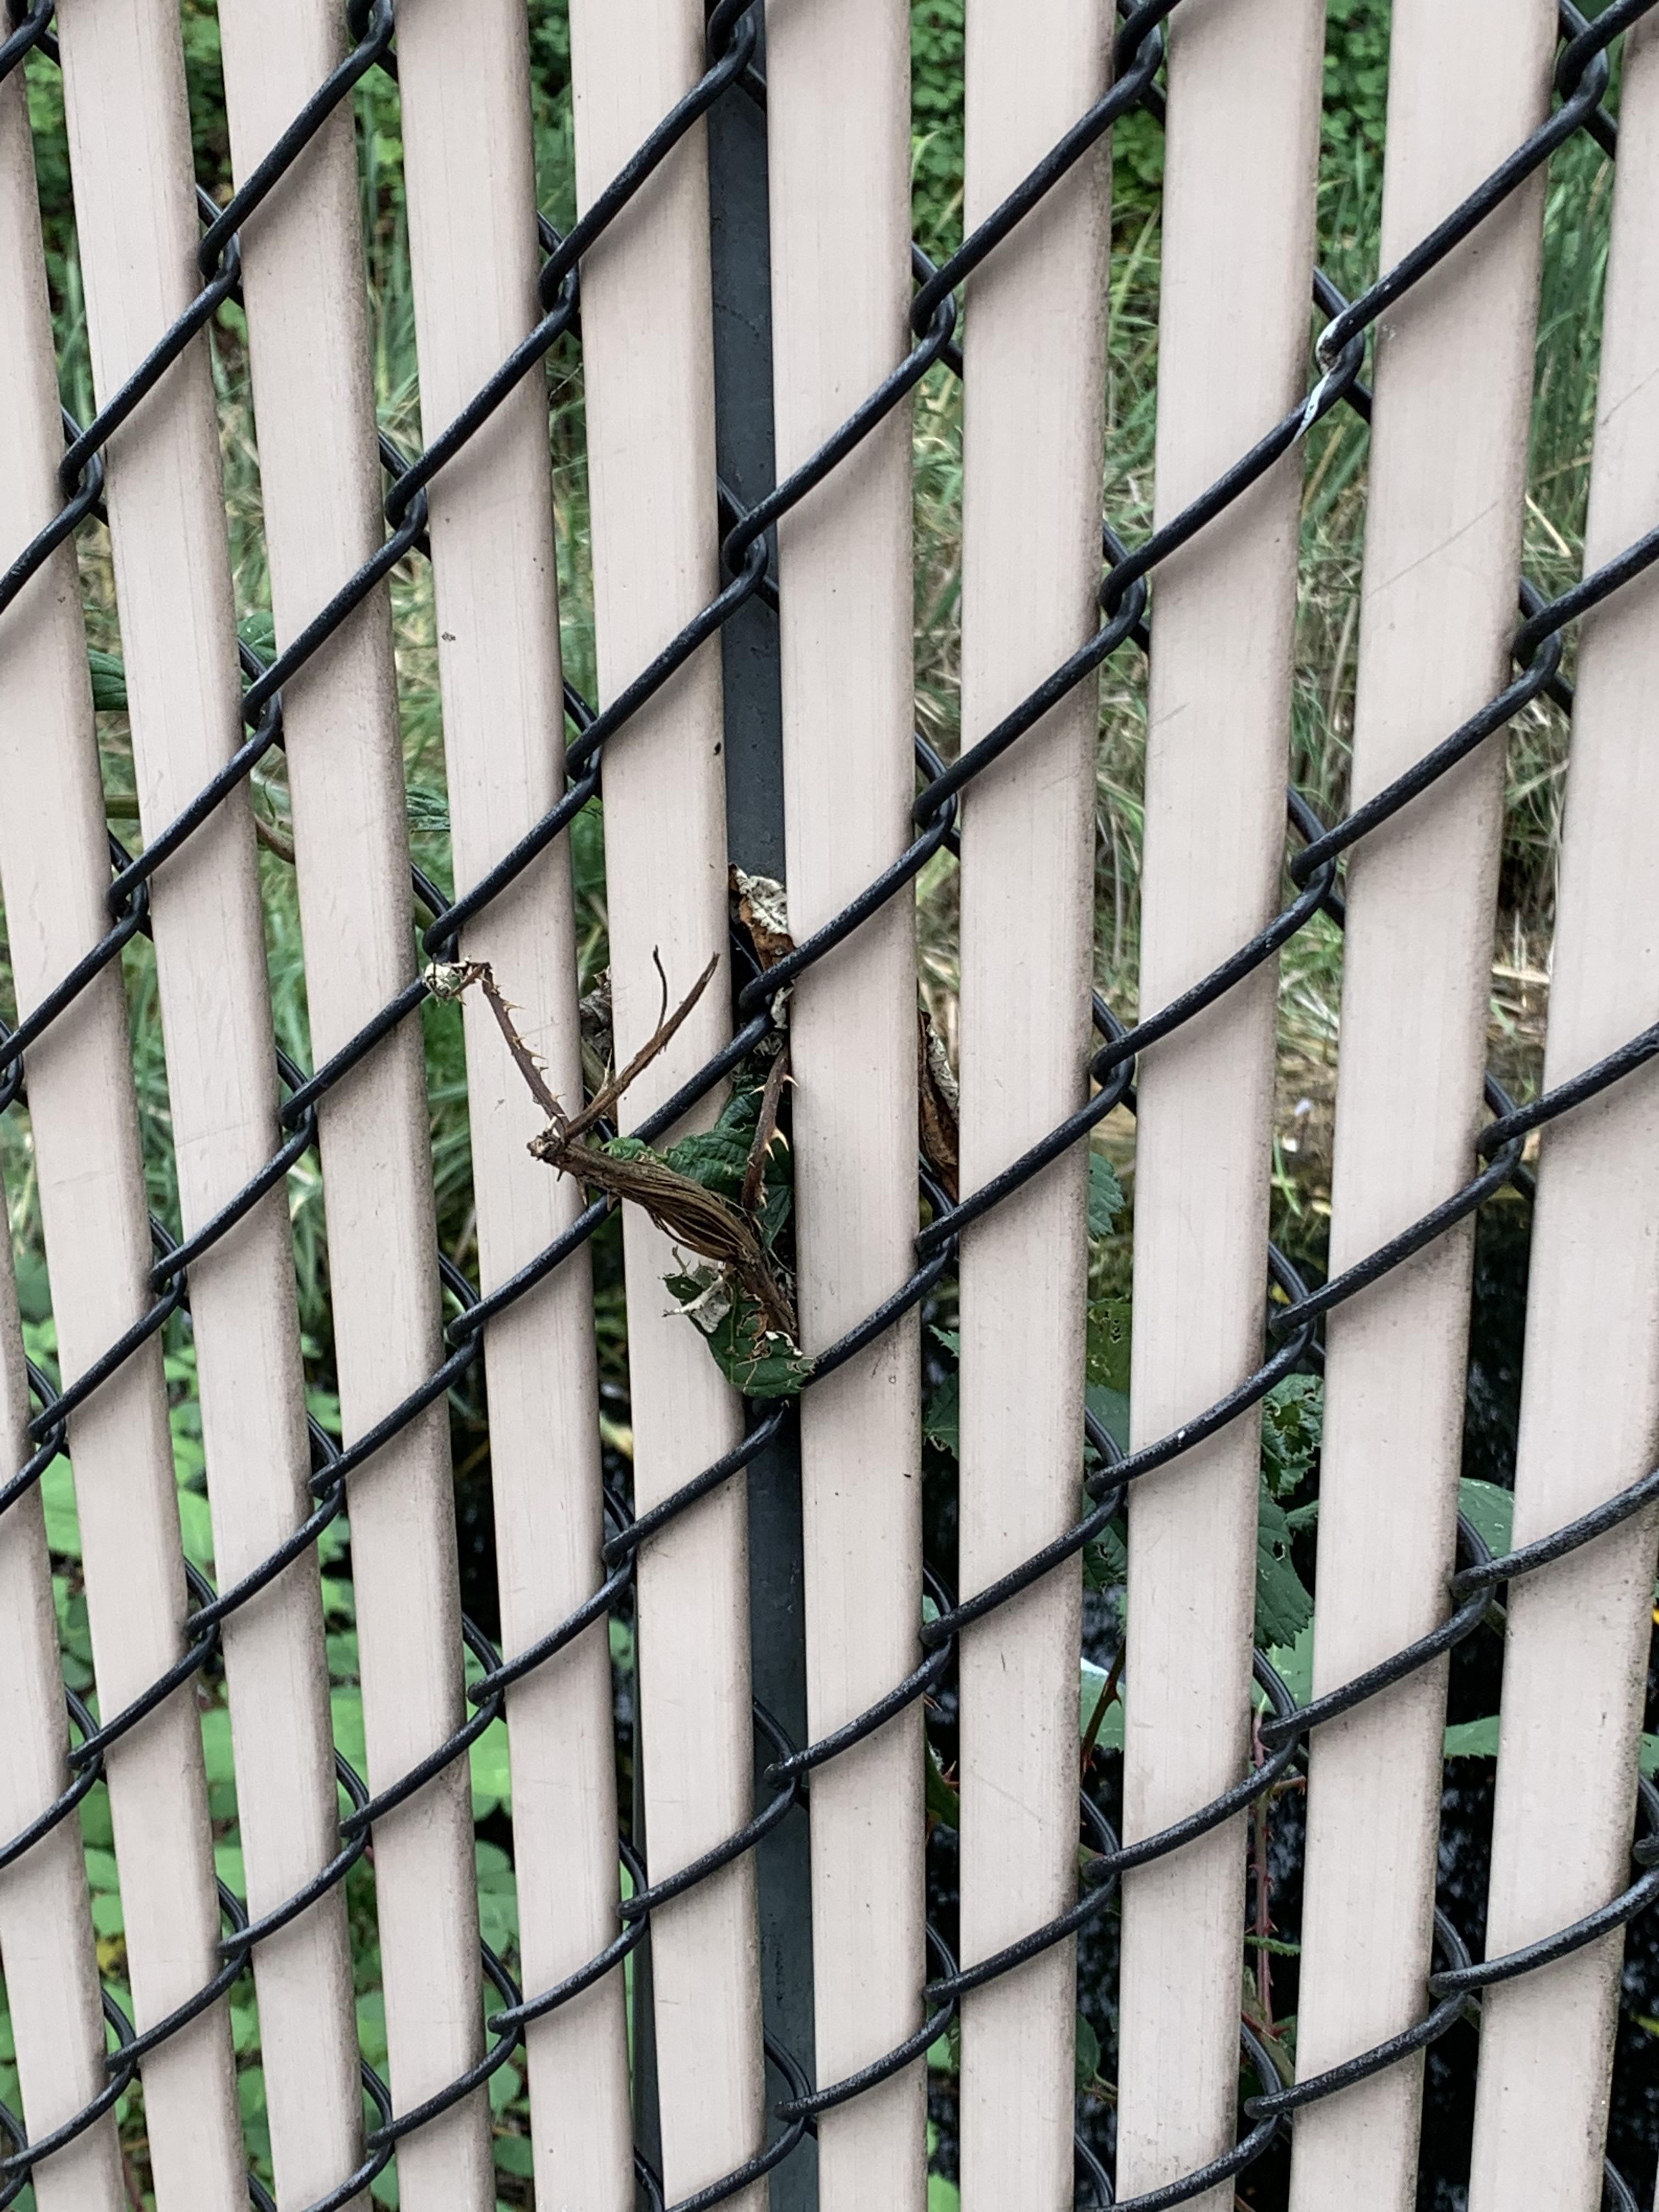 Fence-vine